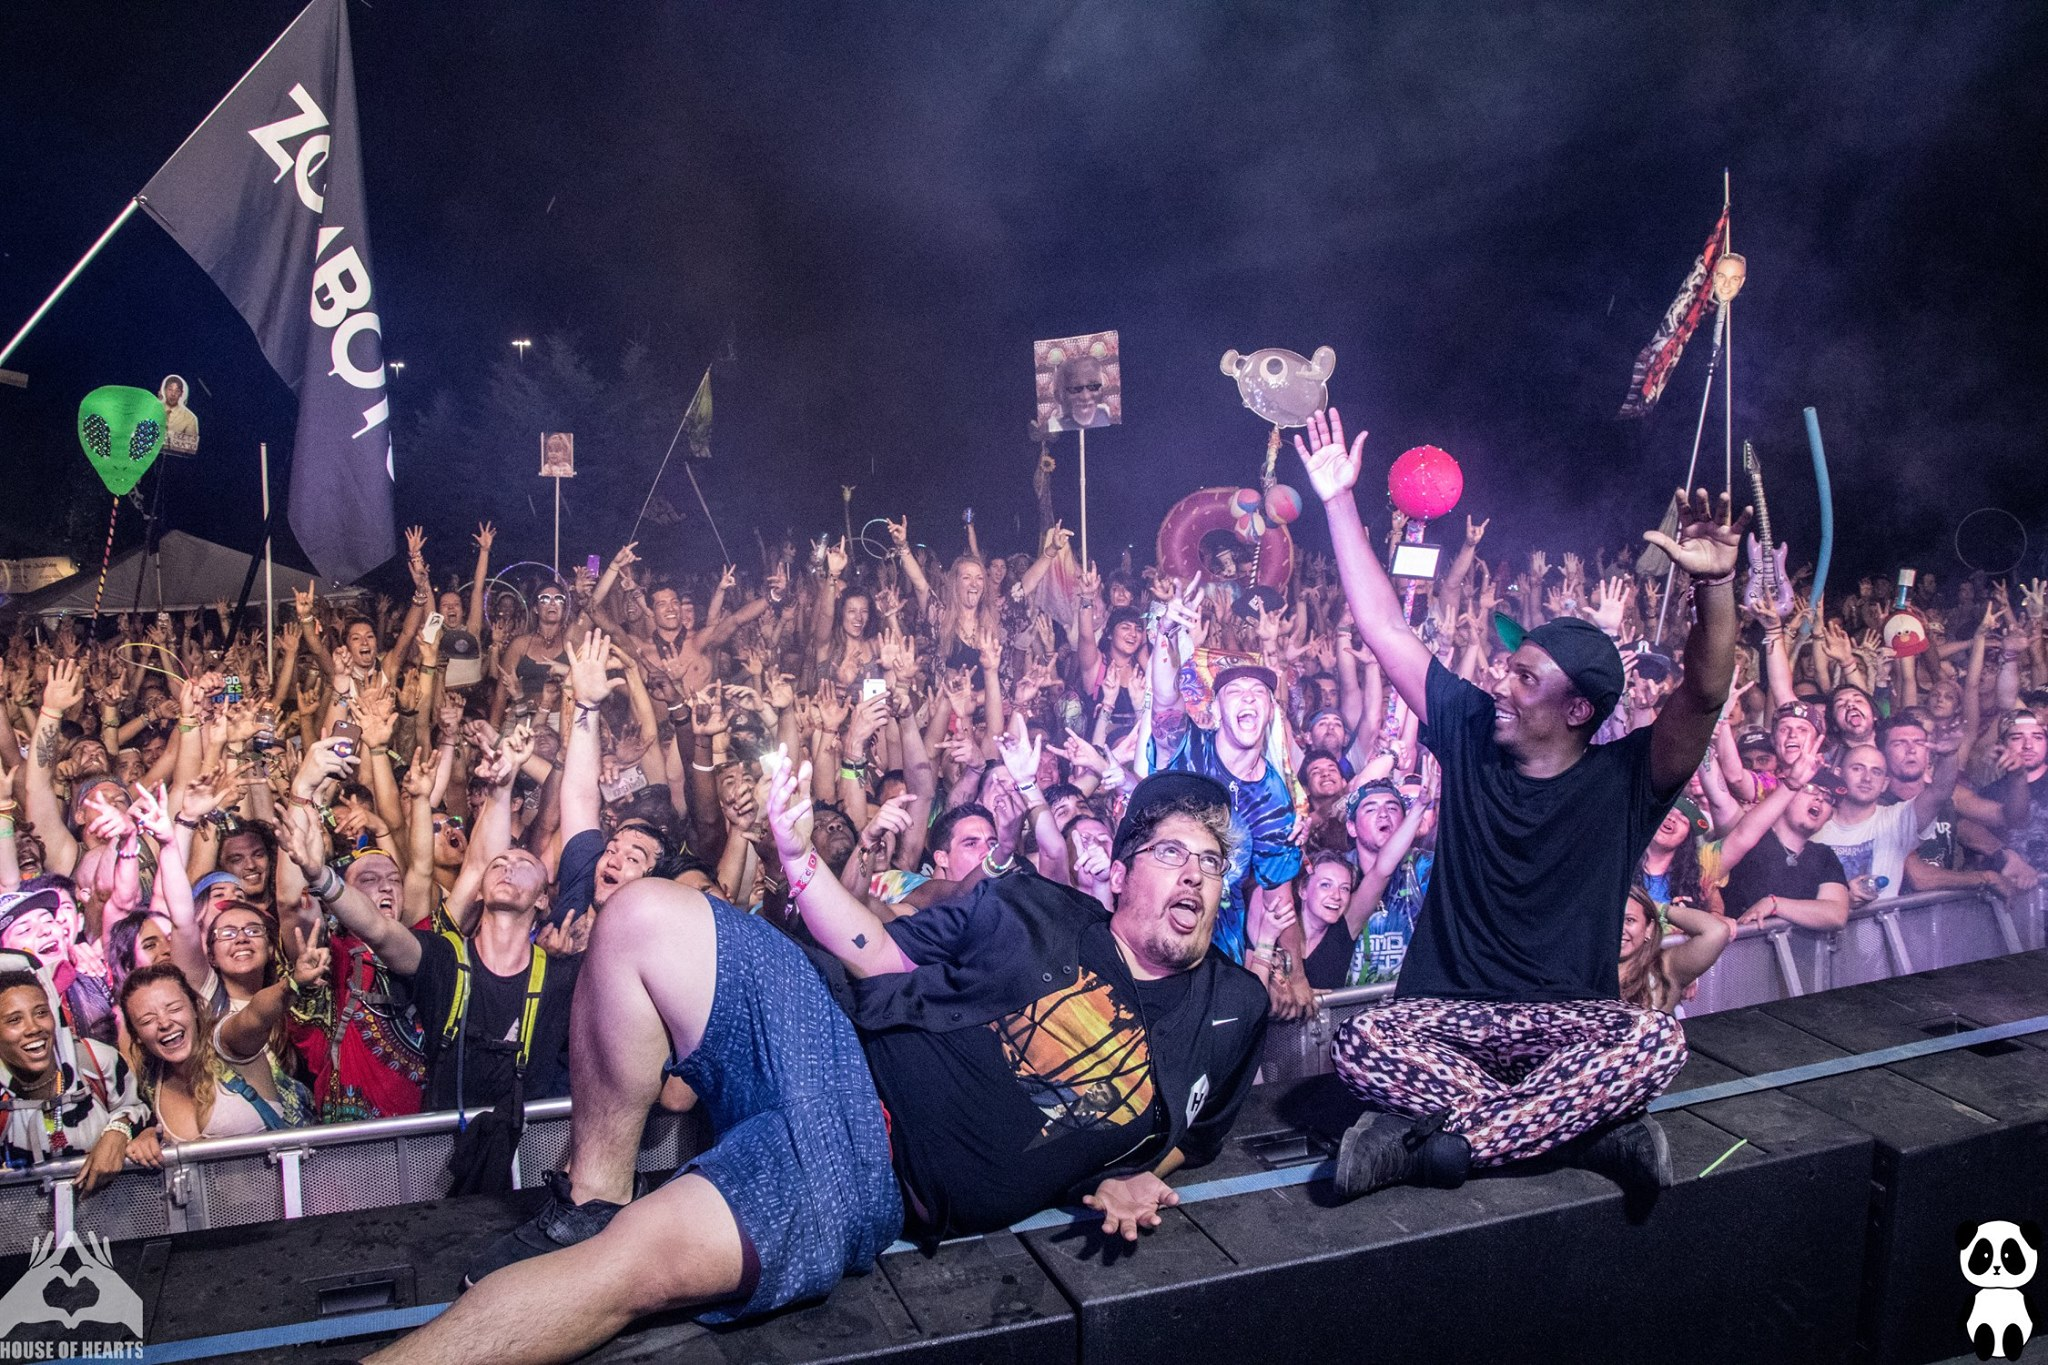 Camp Bisco 2016 - Photo by Zack Bruzgo of Panda Media